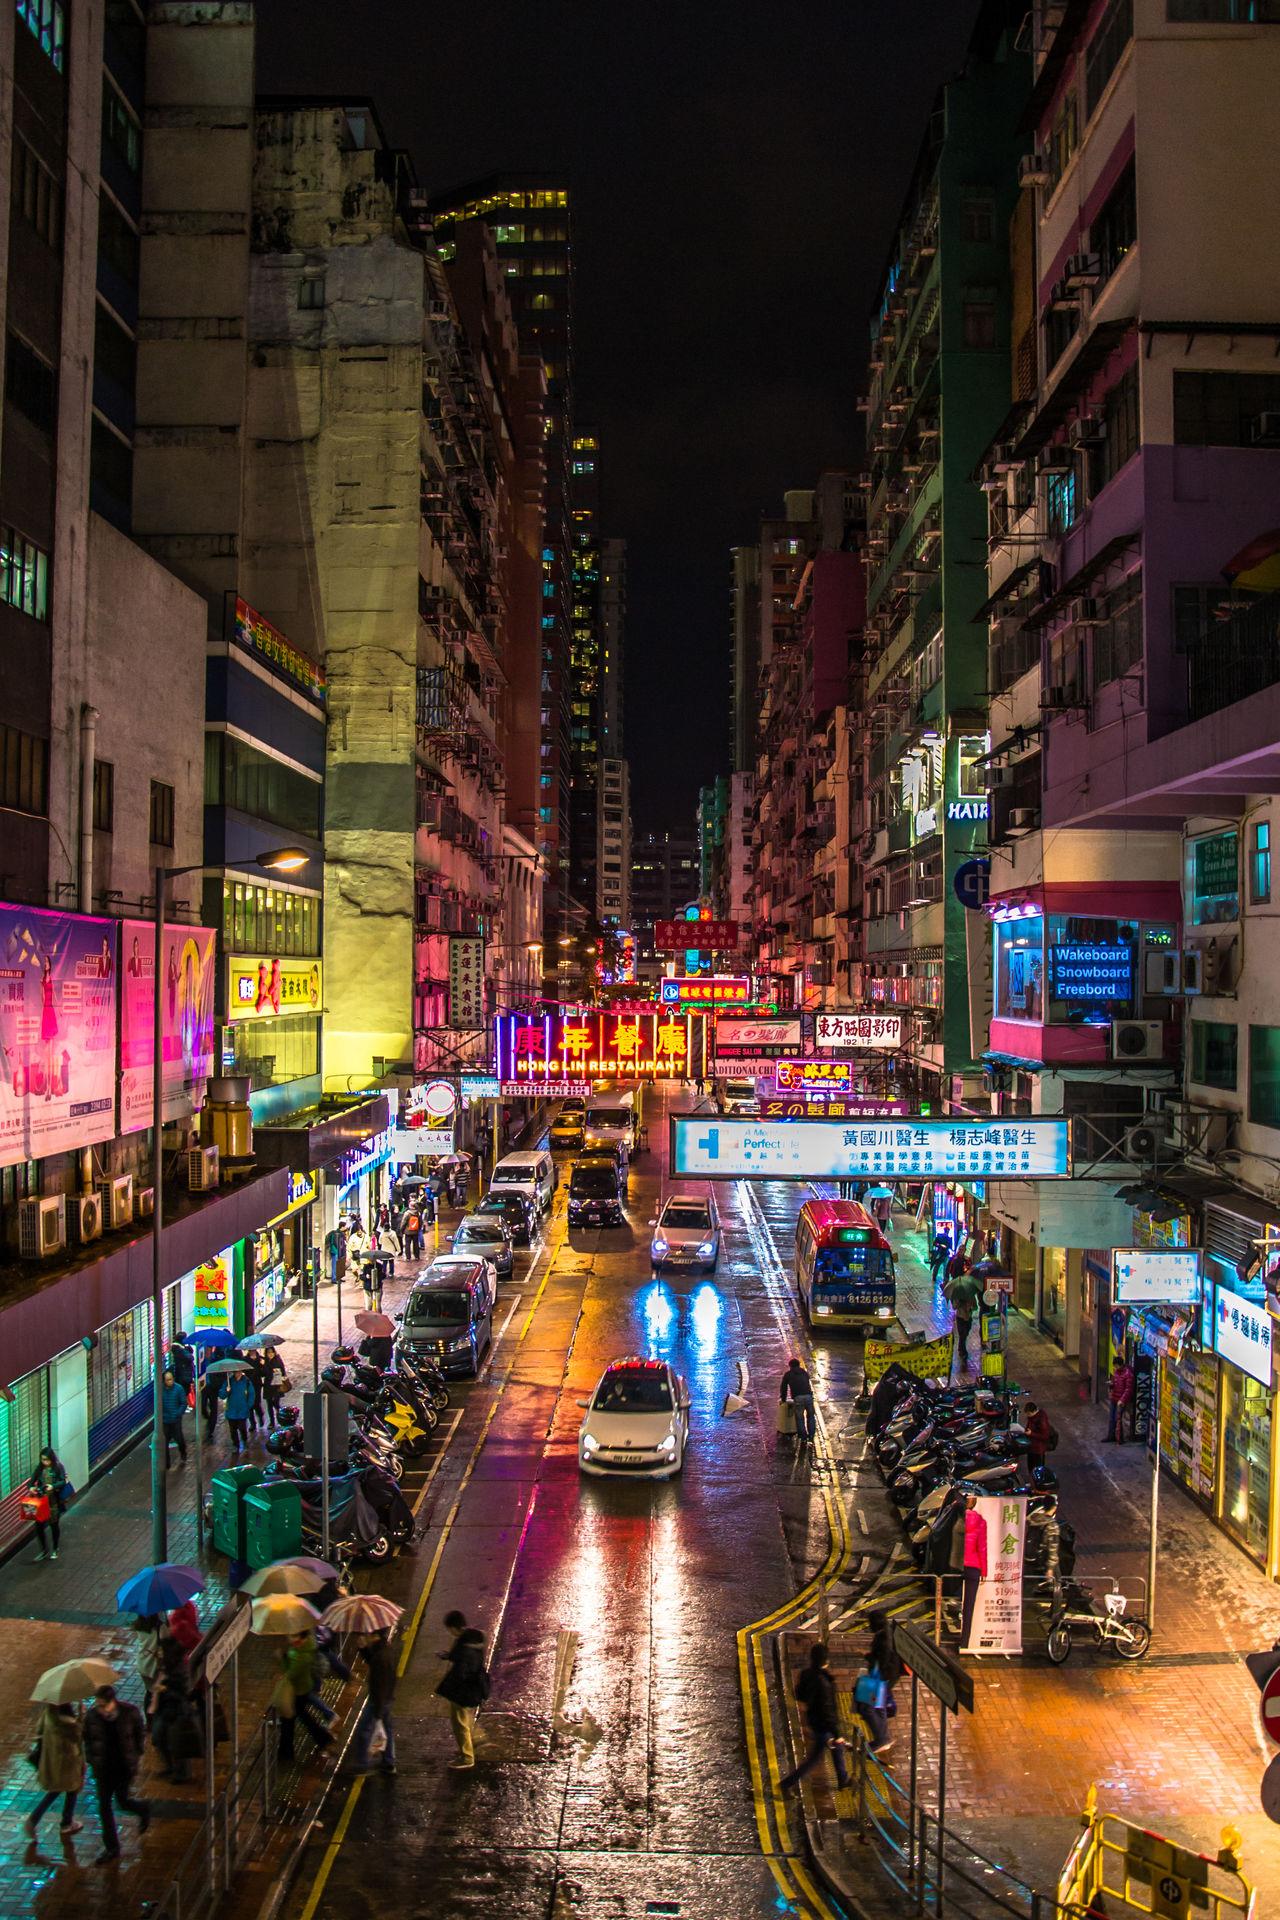 ASIA Available Light Bus China EyeEm Best Shots EyeEm Gallery HongKong Hongkongstreet Kowloon Lights Streetphotography Subway Traffic